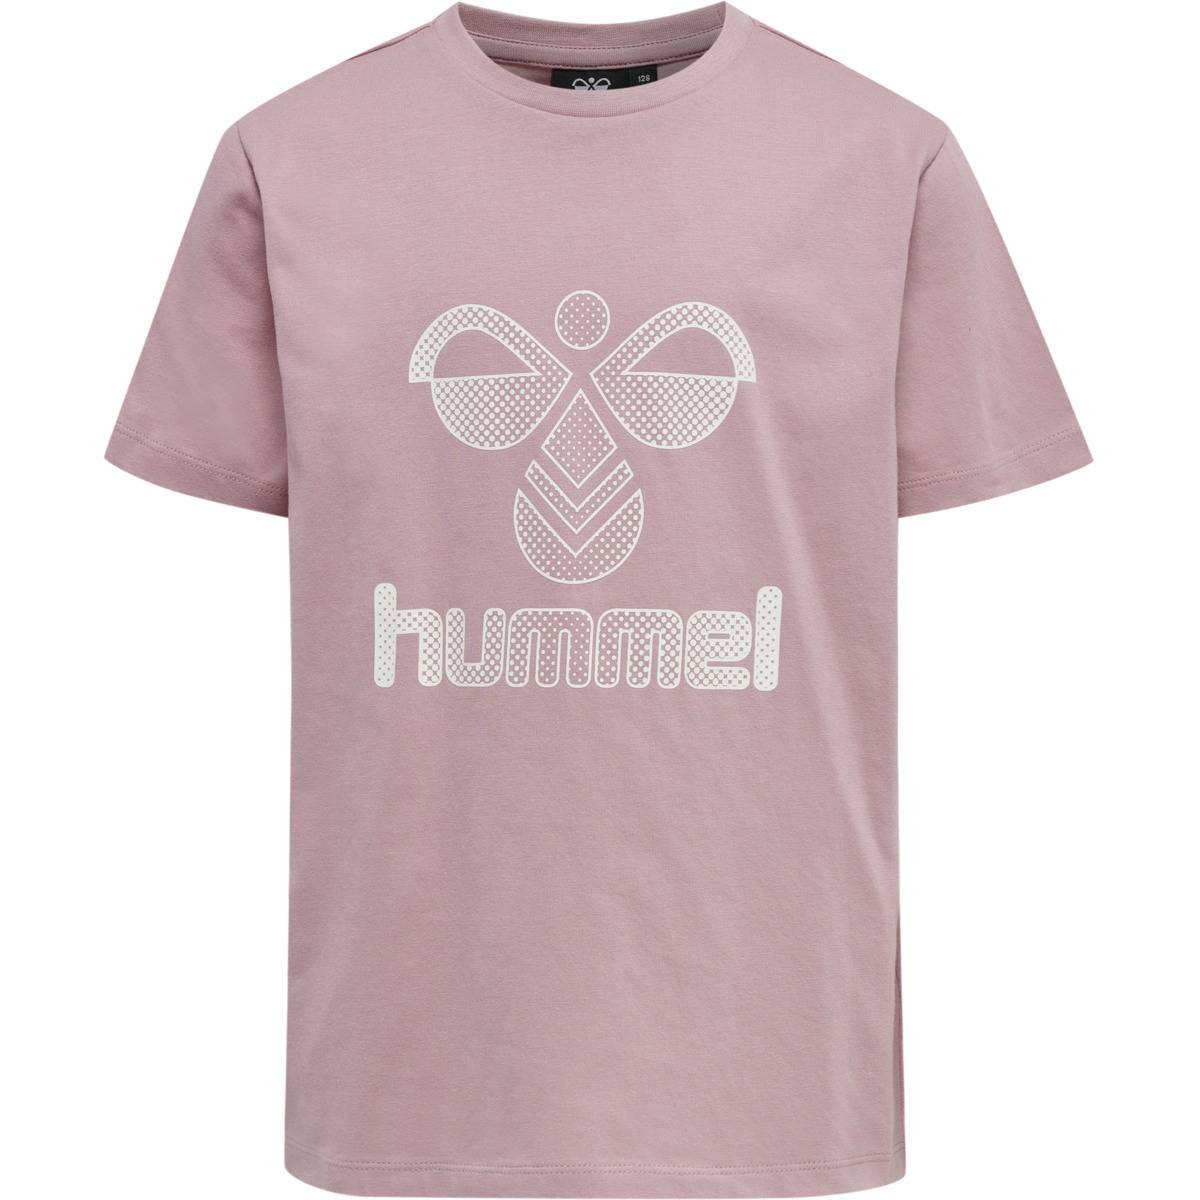 Hummel Proud t-skjorte - lilas